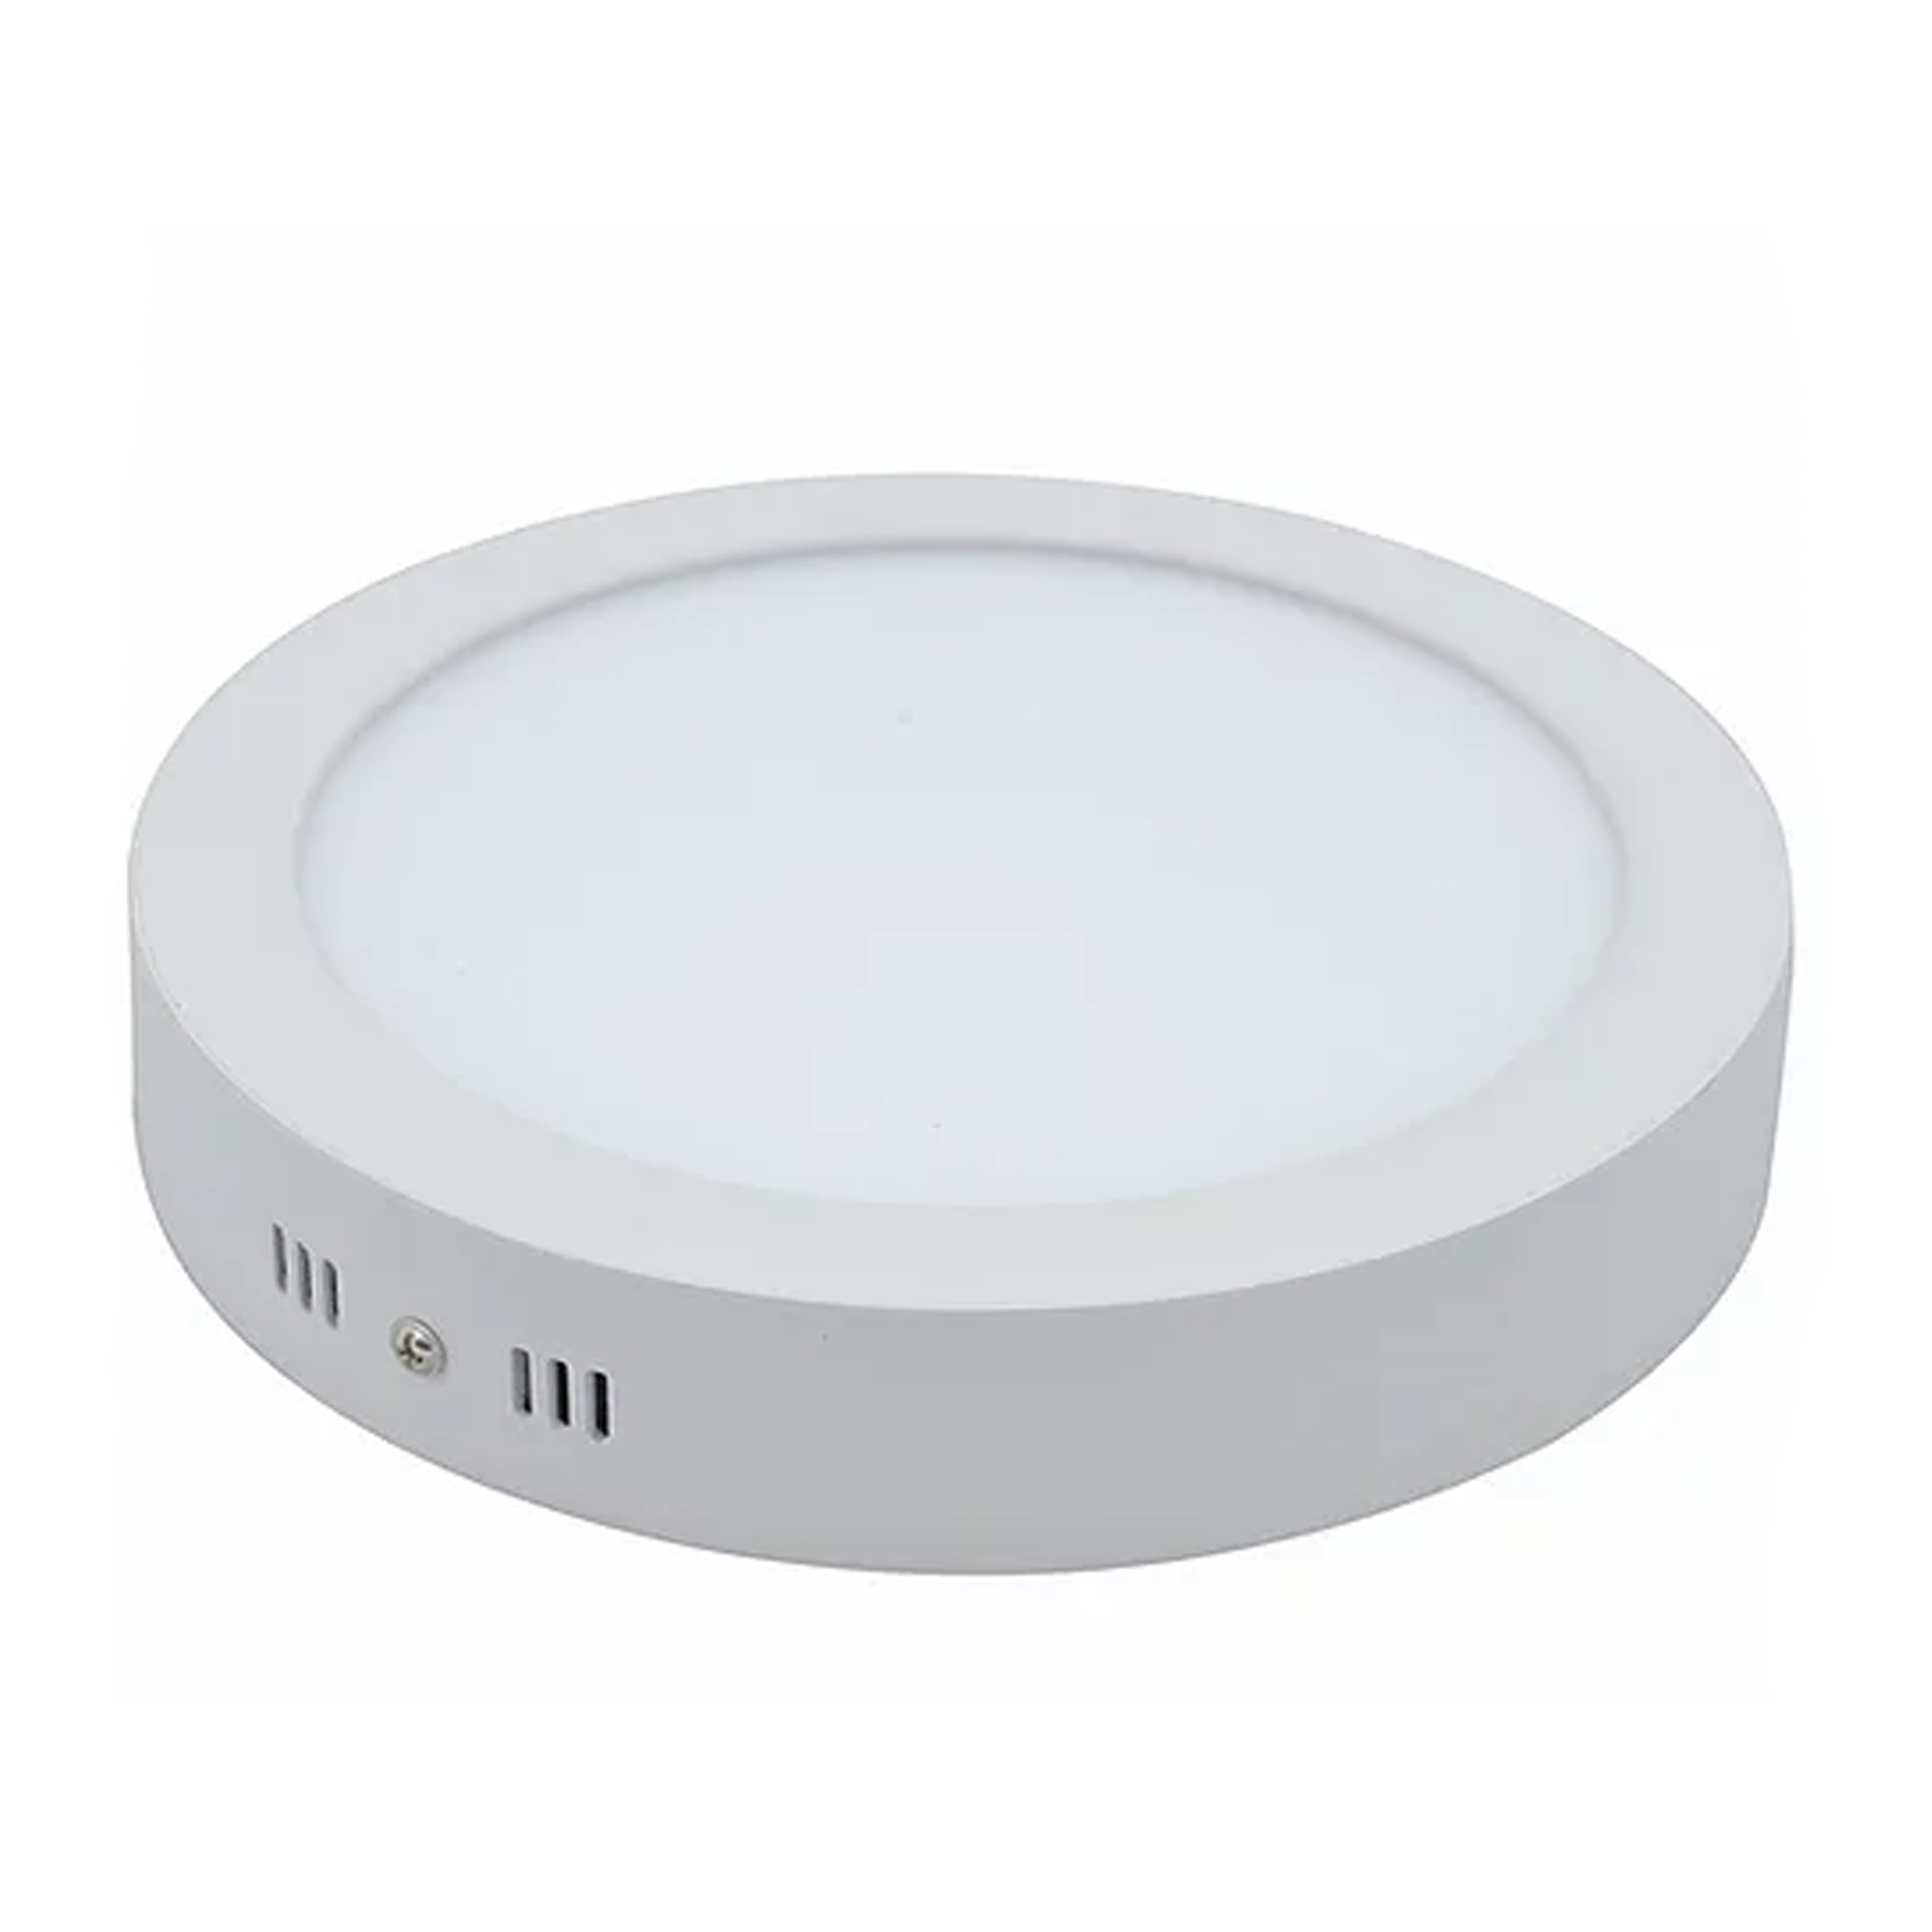 Plafon LED Sobrepor 24W Redondo / Branco Frio